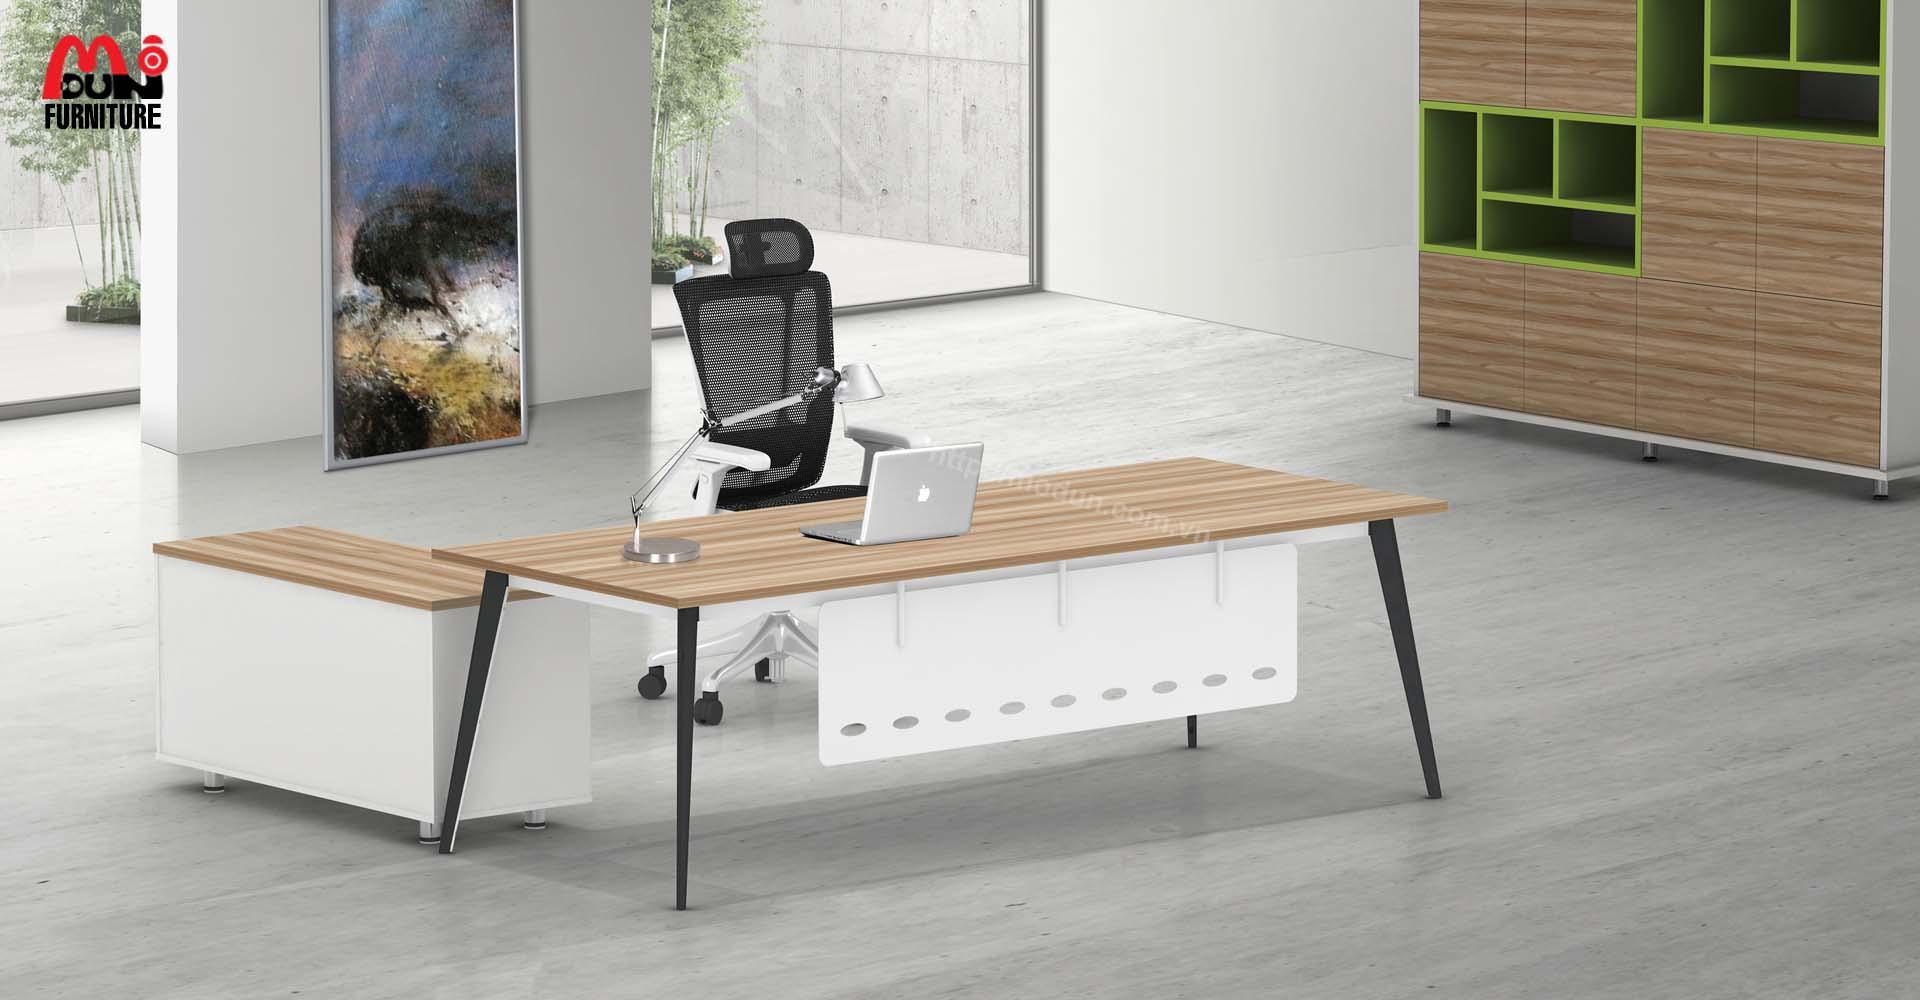 Bàn Chân Sắt MD91 Executive Desk